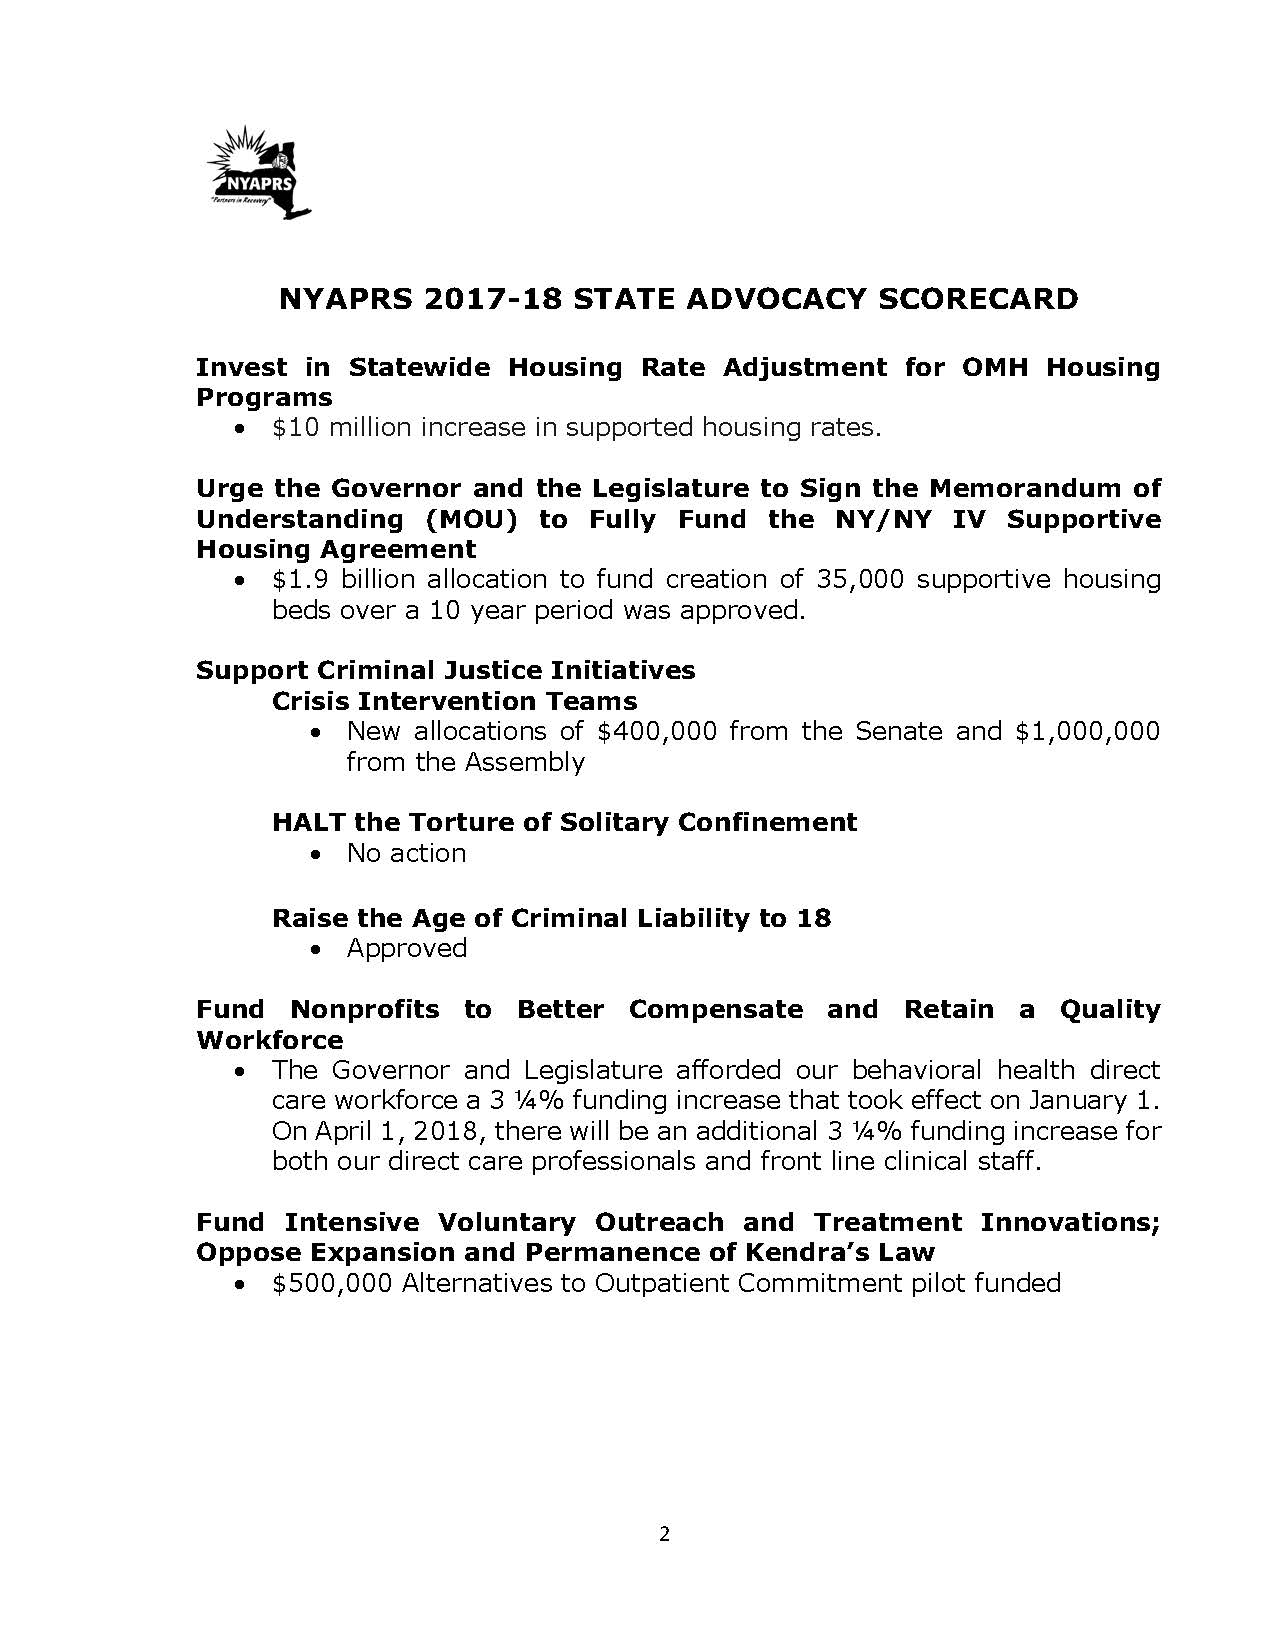 NYAPRS Final 2018 Legislative Day Book_Page_02.jpg